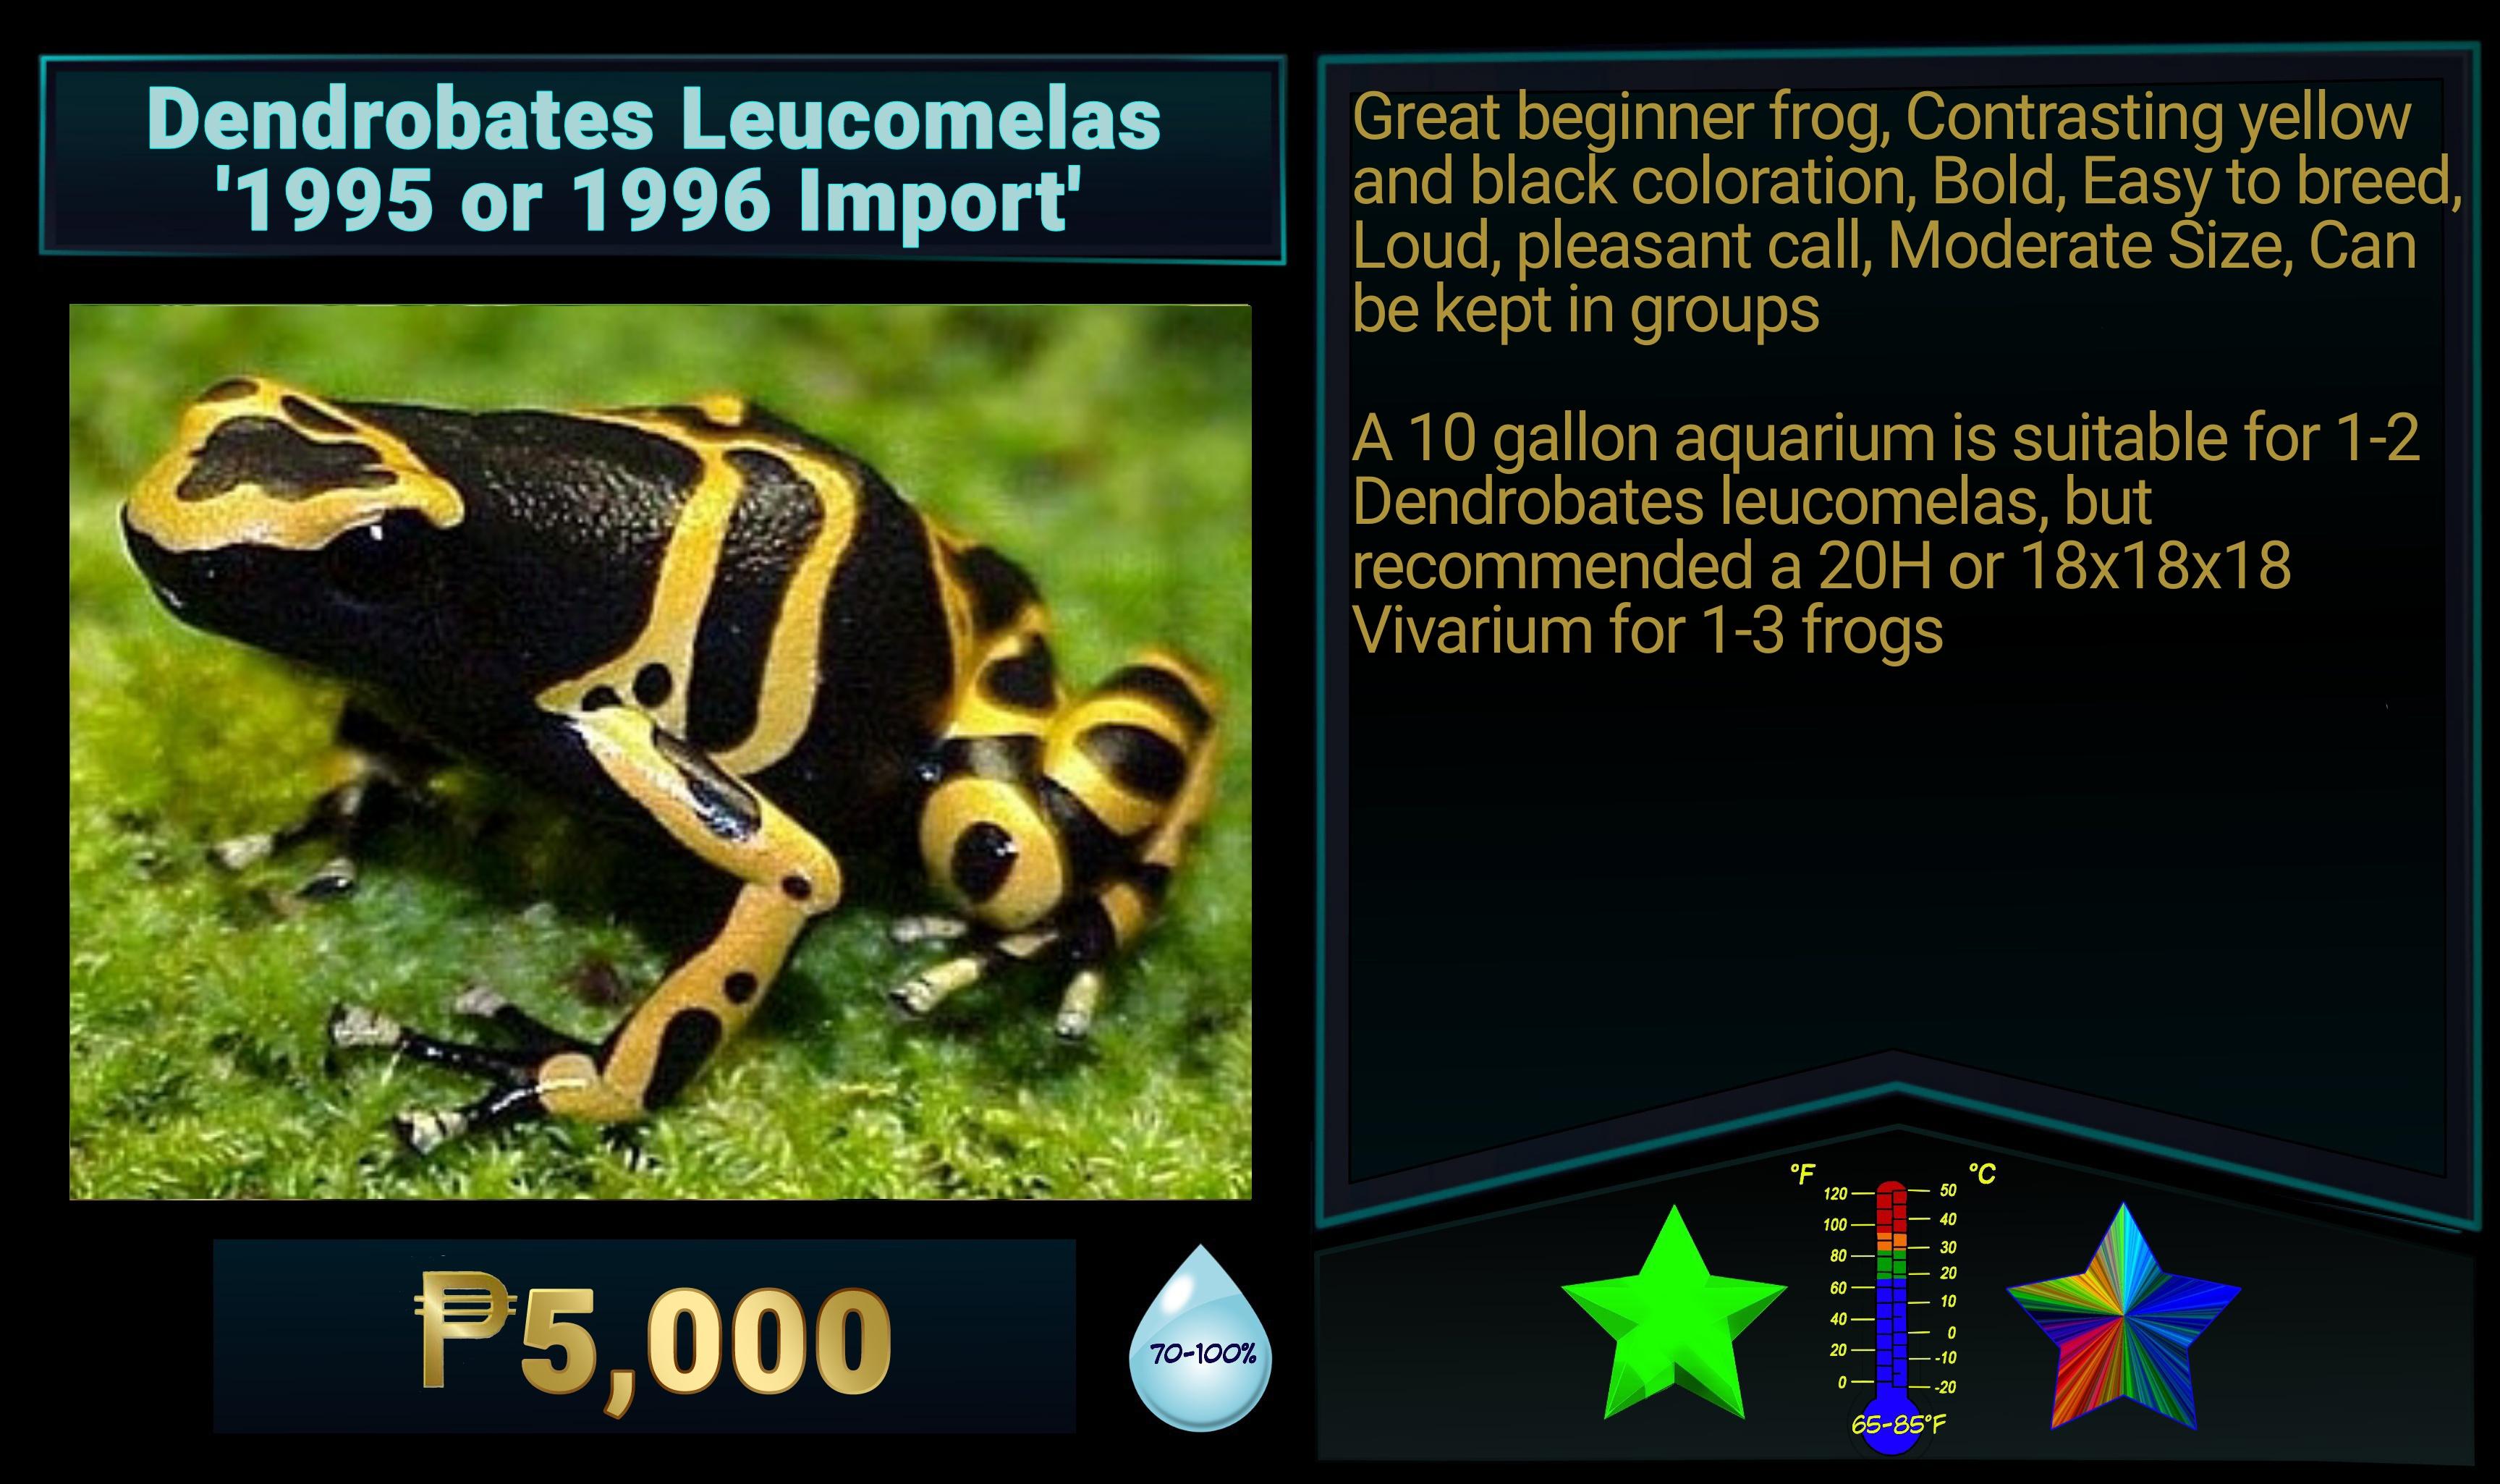 Dendrobates leucomelas 1995-96 import